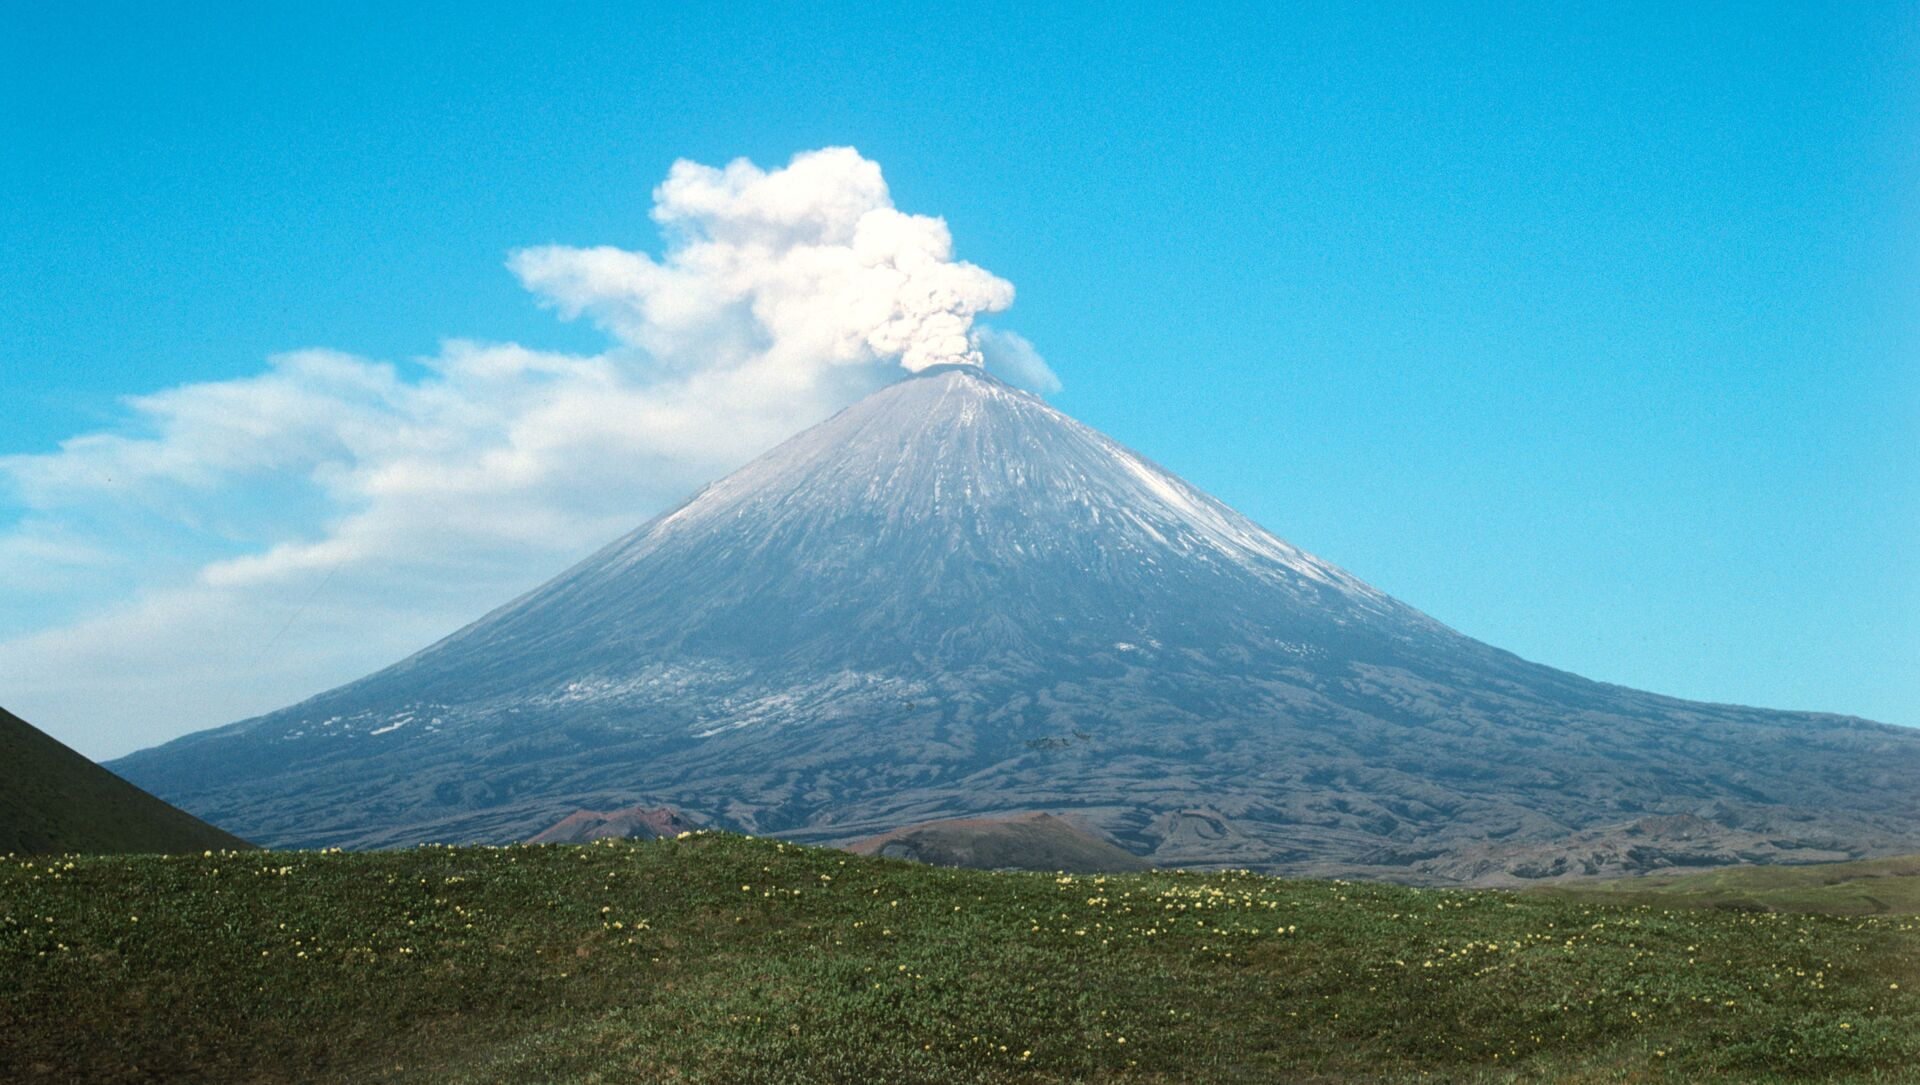 El volcán Kliuchevskói, en la península de Kamchatka (archivo) - Sputnik Mundo, 1920, 05.02.2021